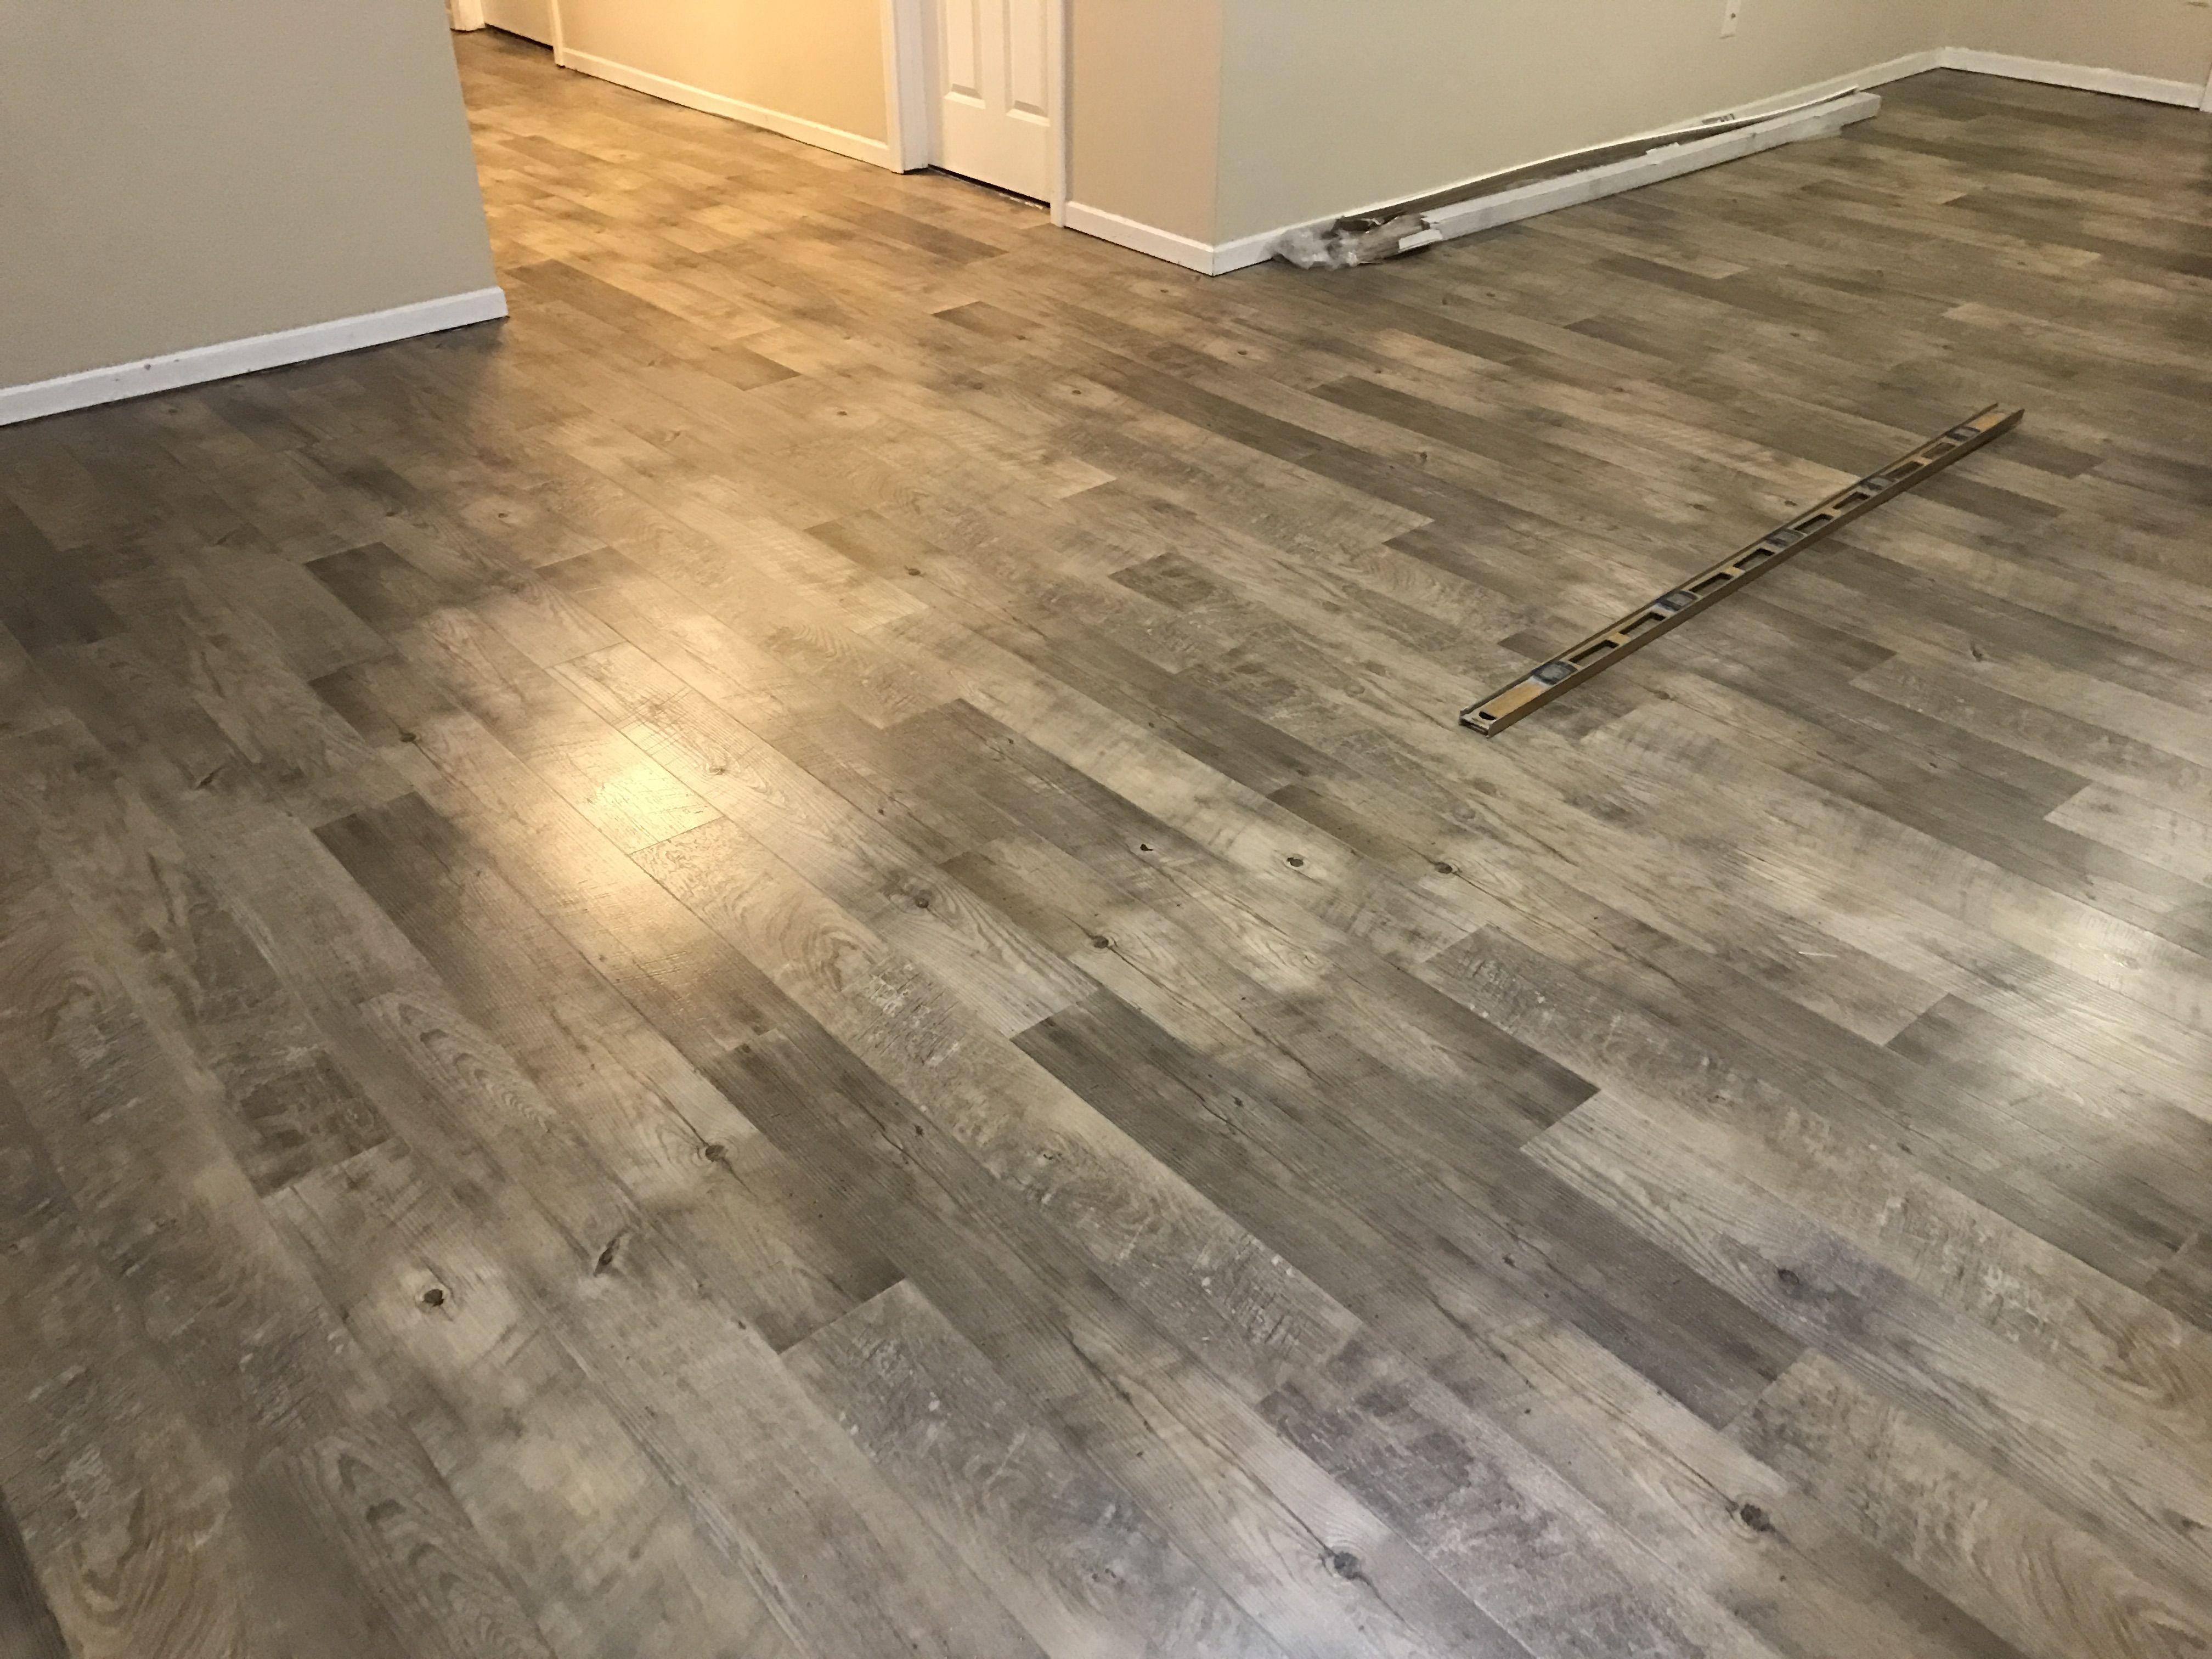 hardwood floor refinishing delaware of weathered pine vinyl floors pinterest luxury vinyl plank with dockside sand mannington adura luxury vinyl plank glue down in basement